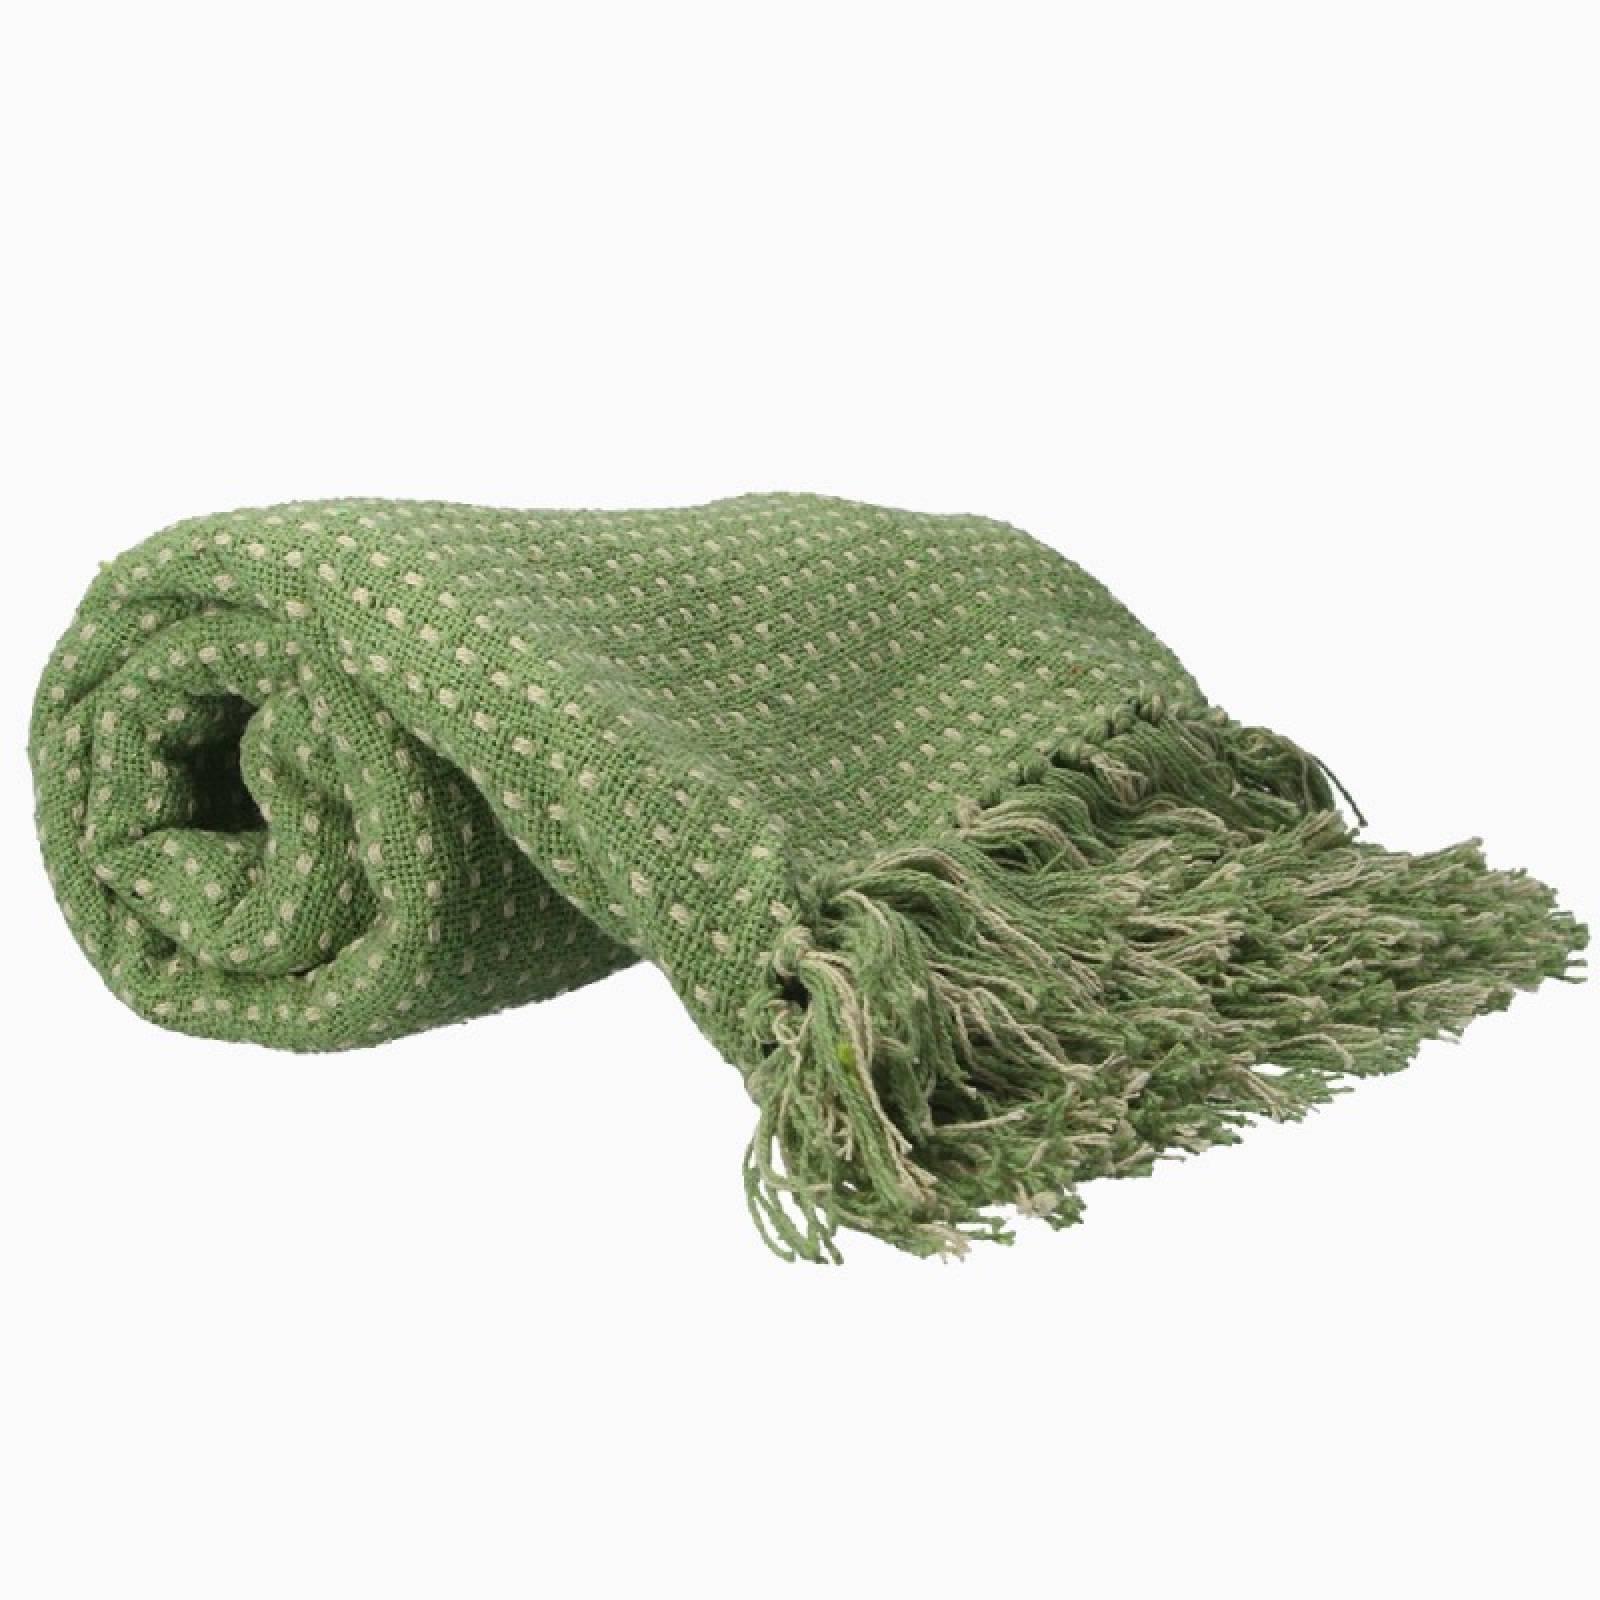 Stab Stitch Cotton Blanket In Light Green